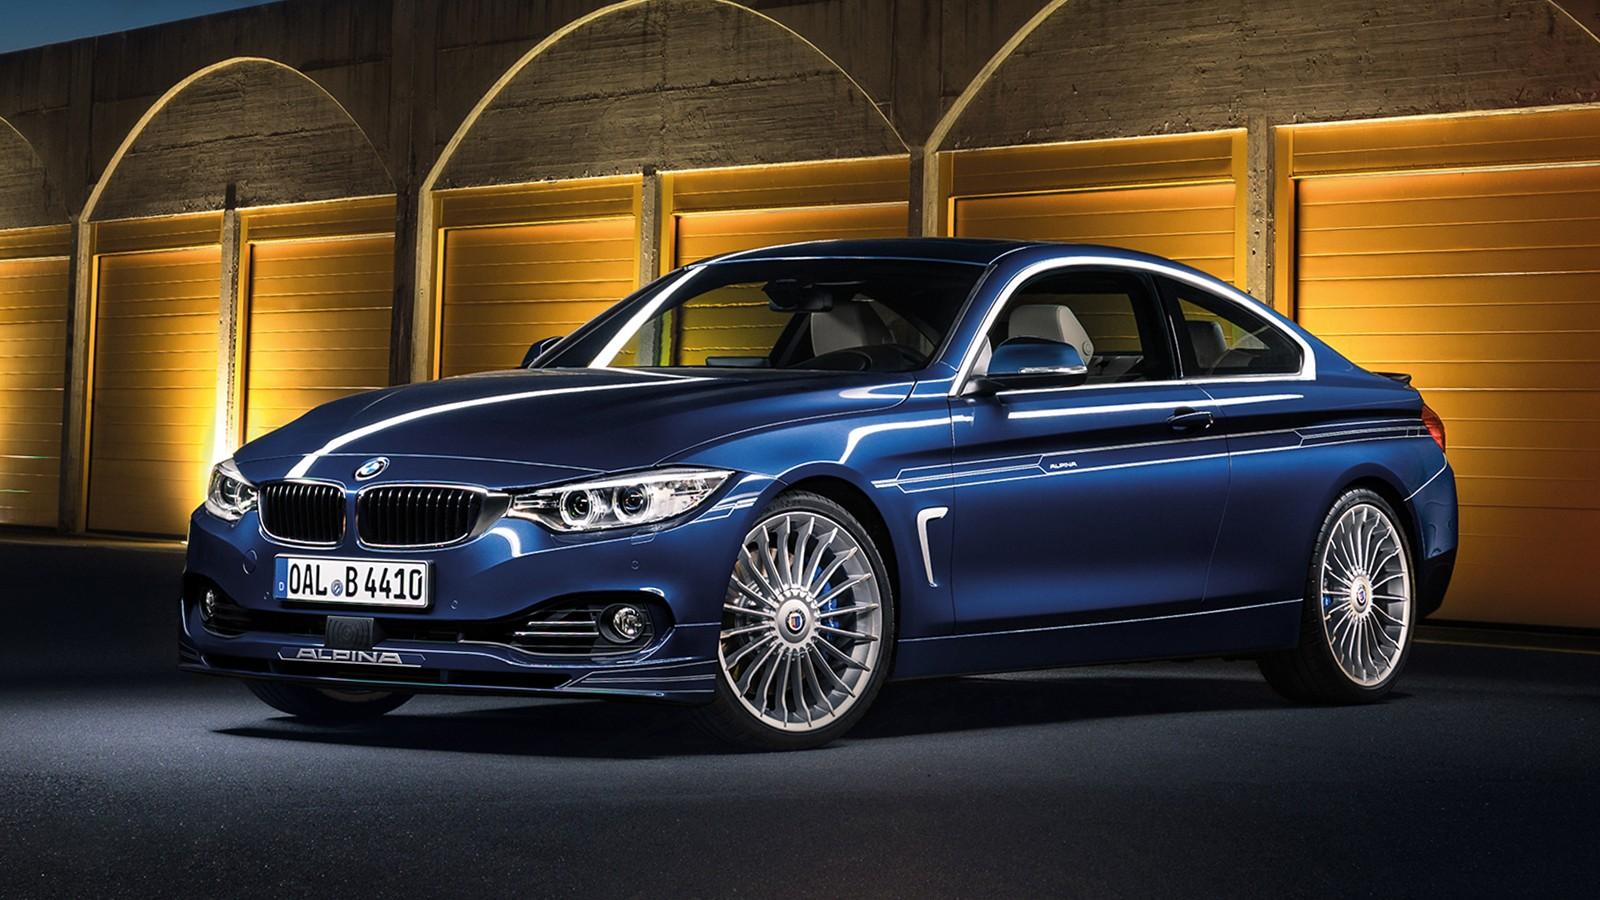 На фото: BMW Alpina B4 Bi-Turbo Coupe. Автомобиль оснащён 410-сильной